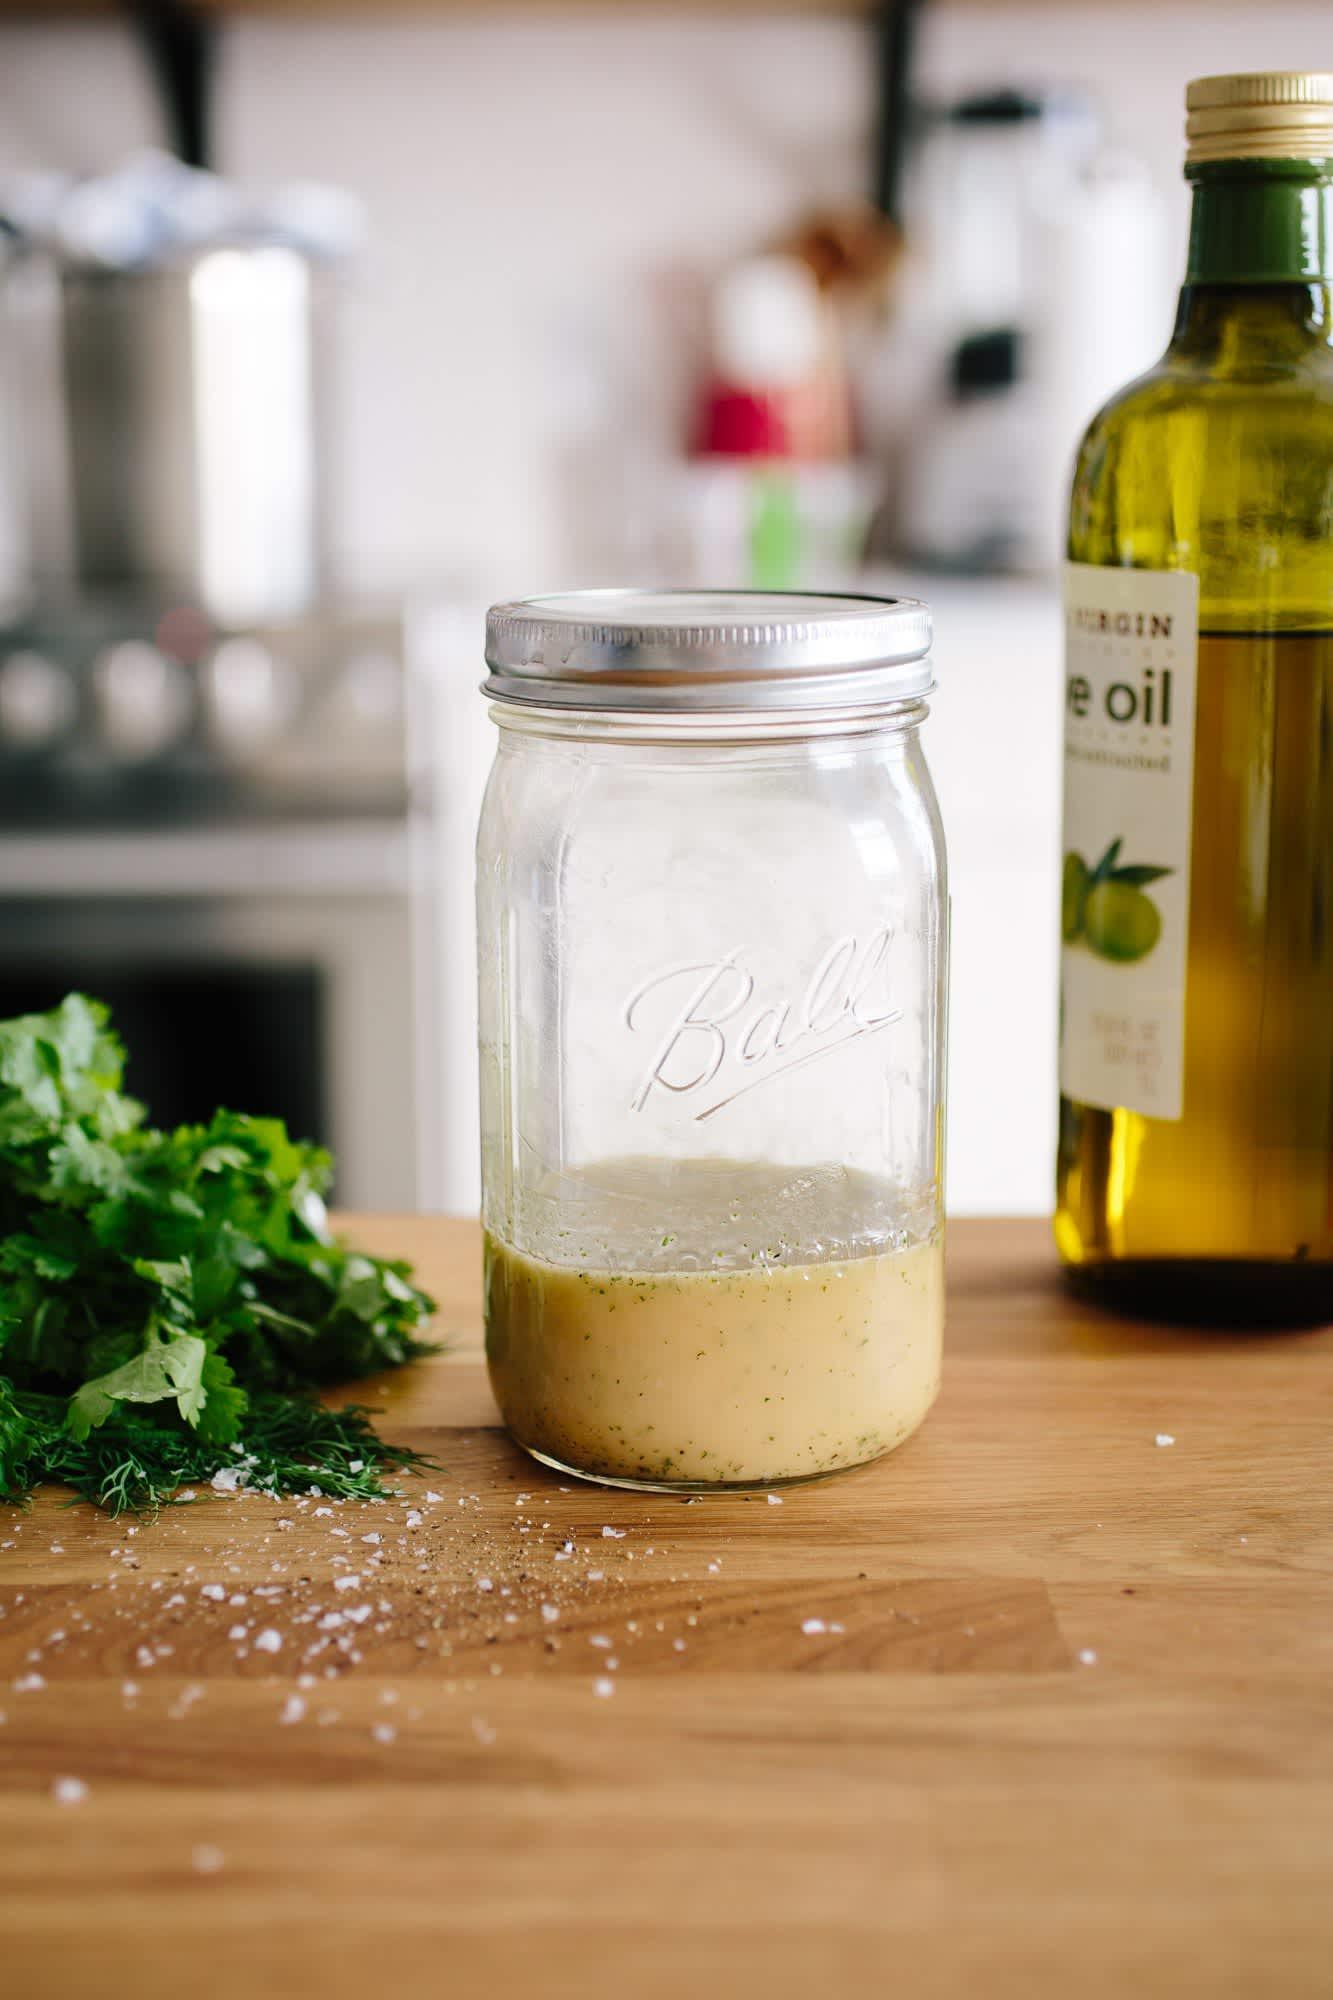 How To Make a Basic Vinaigrette